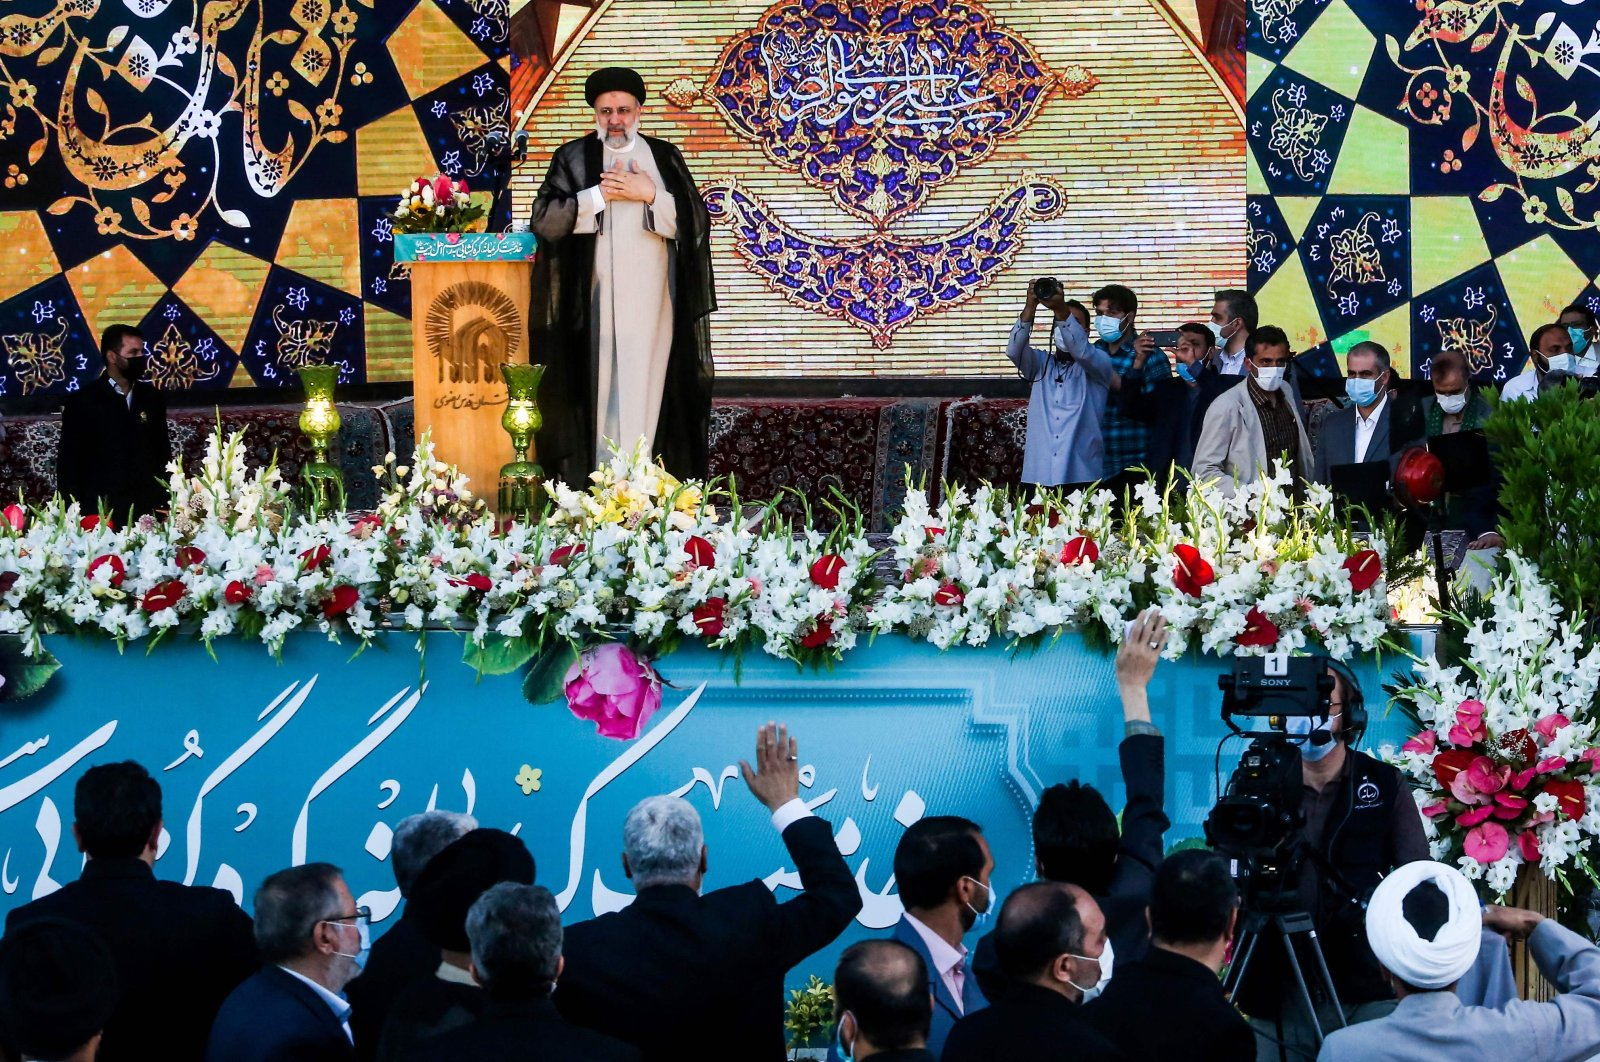 Iran's President-elect Ebrahim Raisi delivers a speech at the Imam Reza shrine in the city of Mashhad in northeastern Iran, June 22, 2021. (AFP Photo)